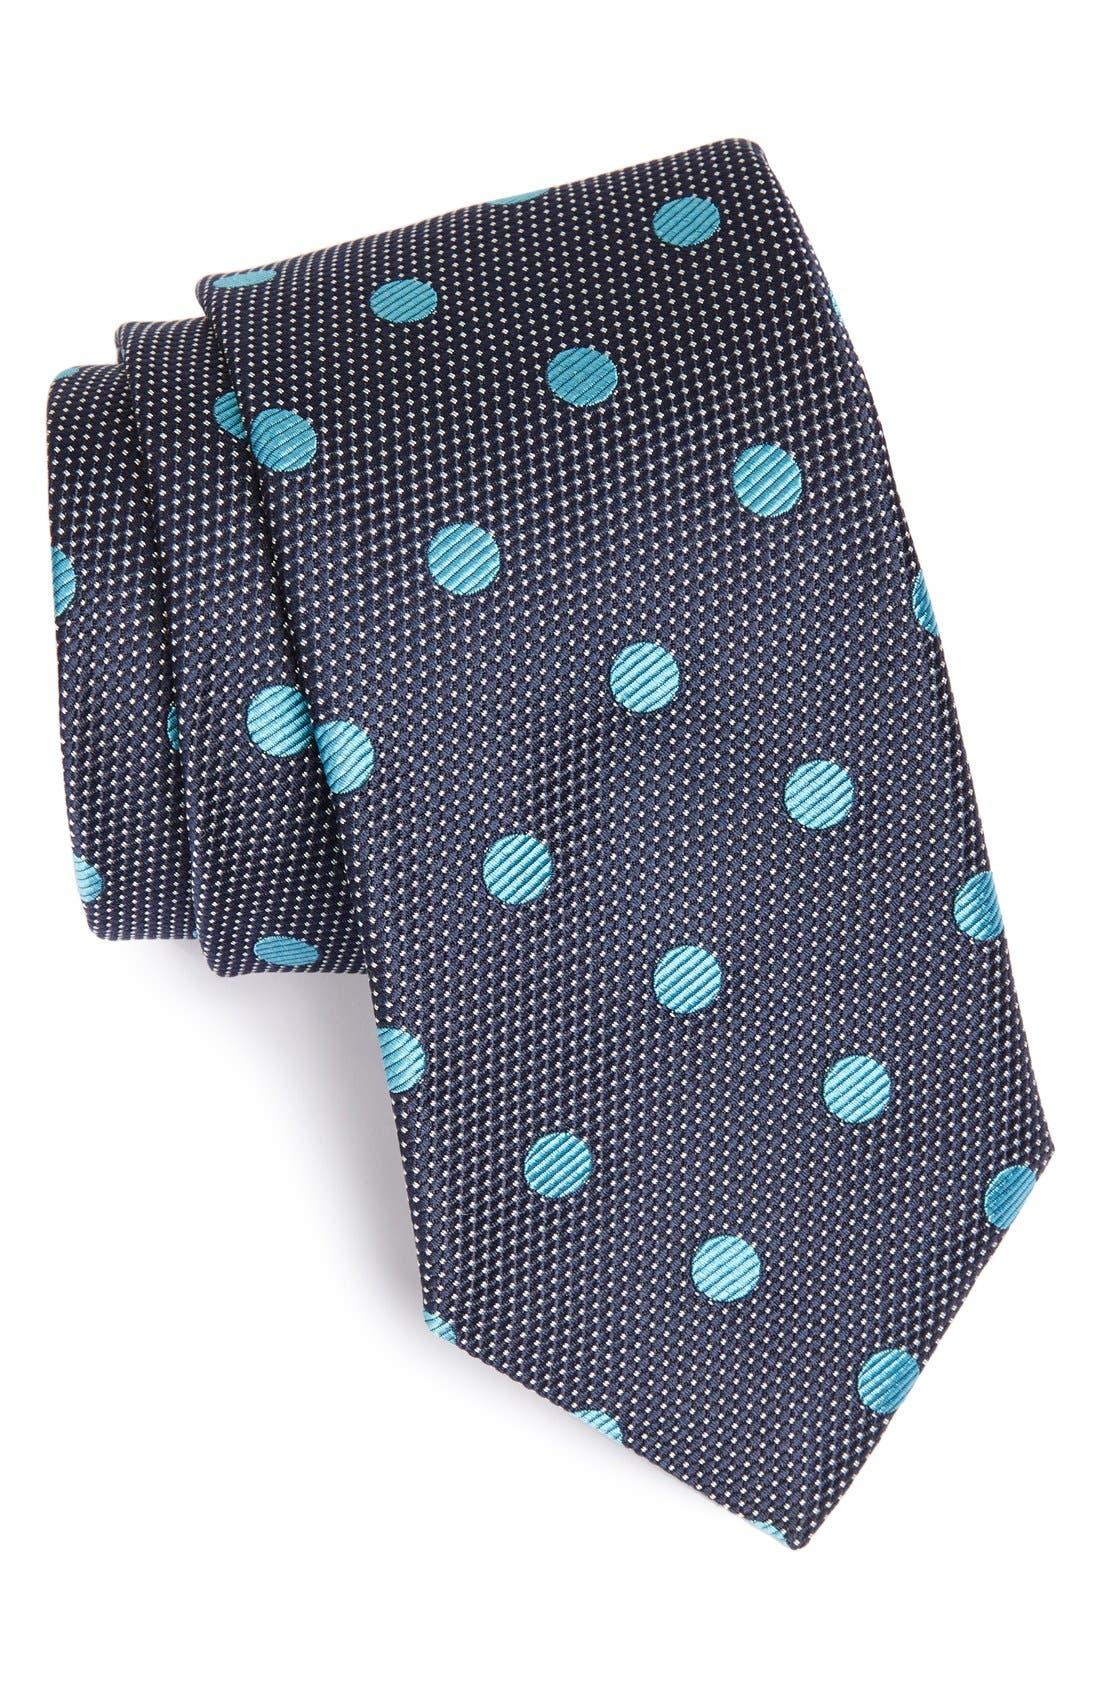 Main Image - Samuelsohn Woven Silk Tie